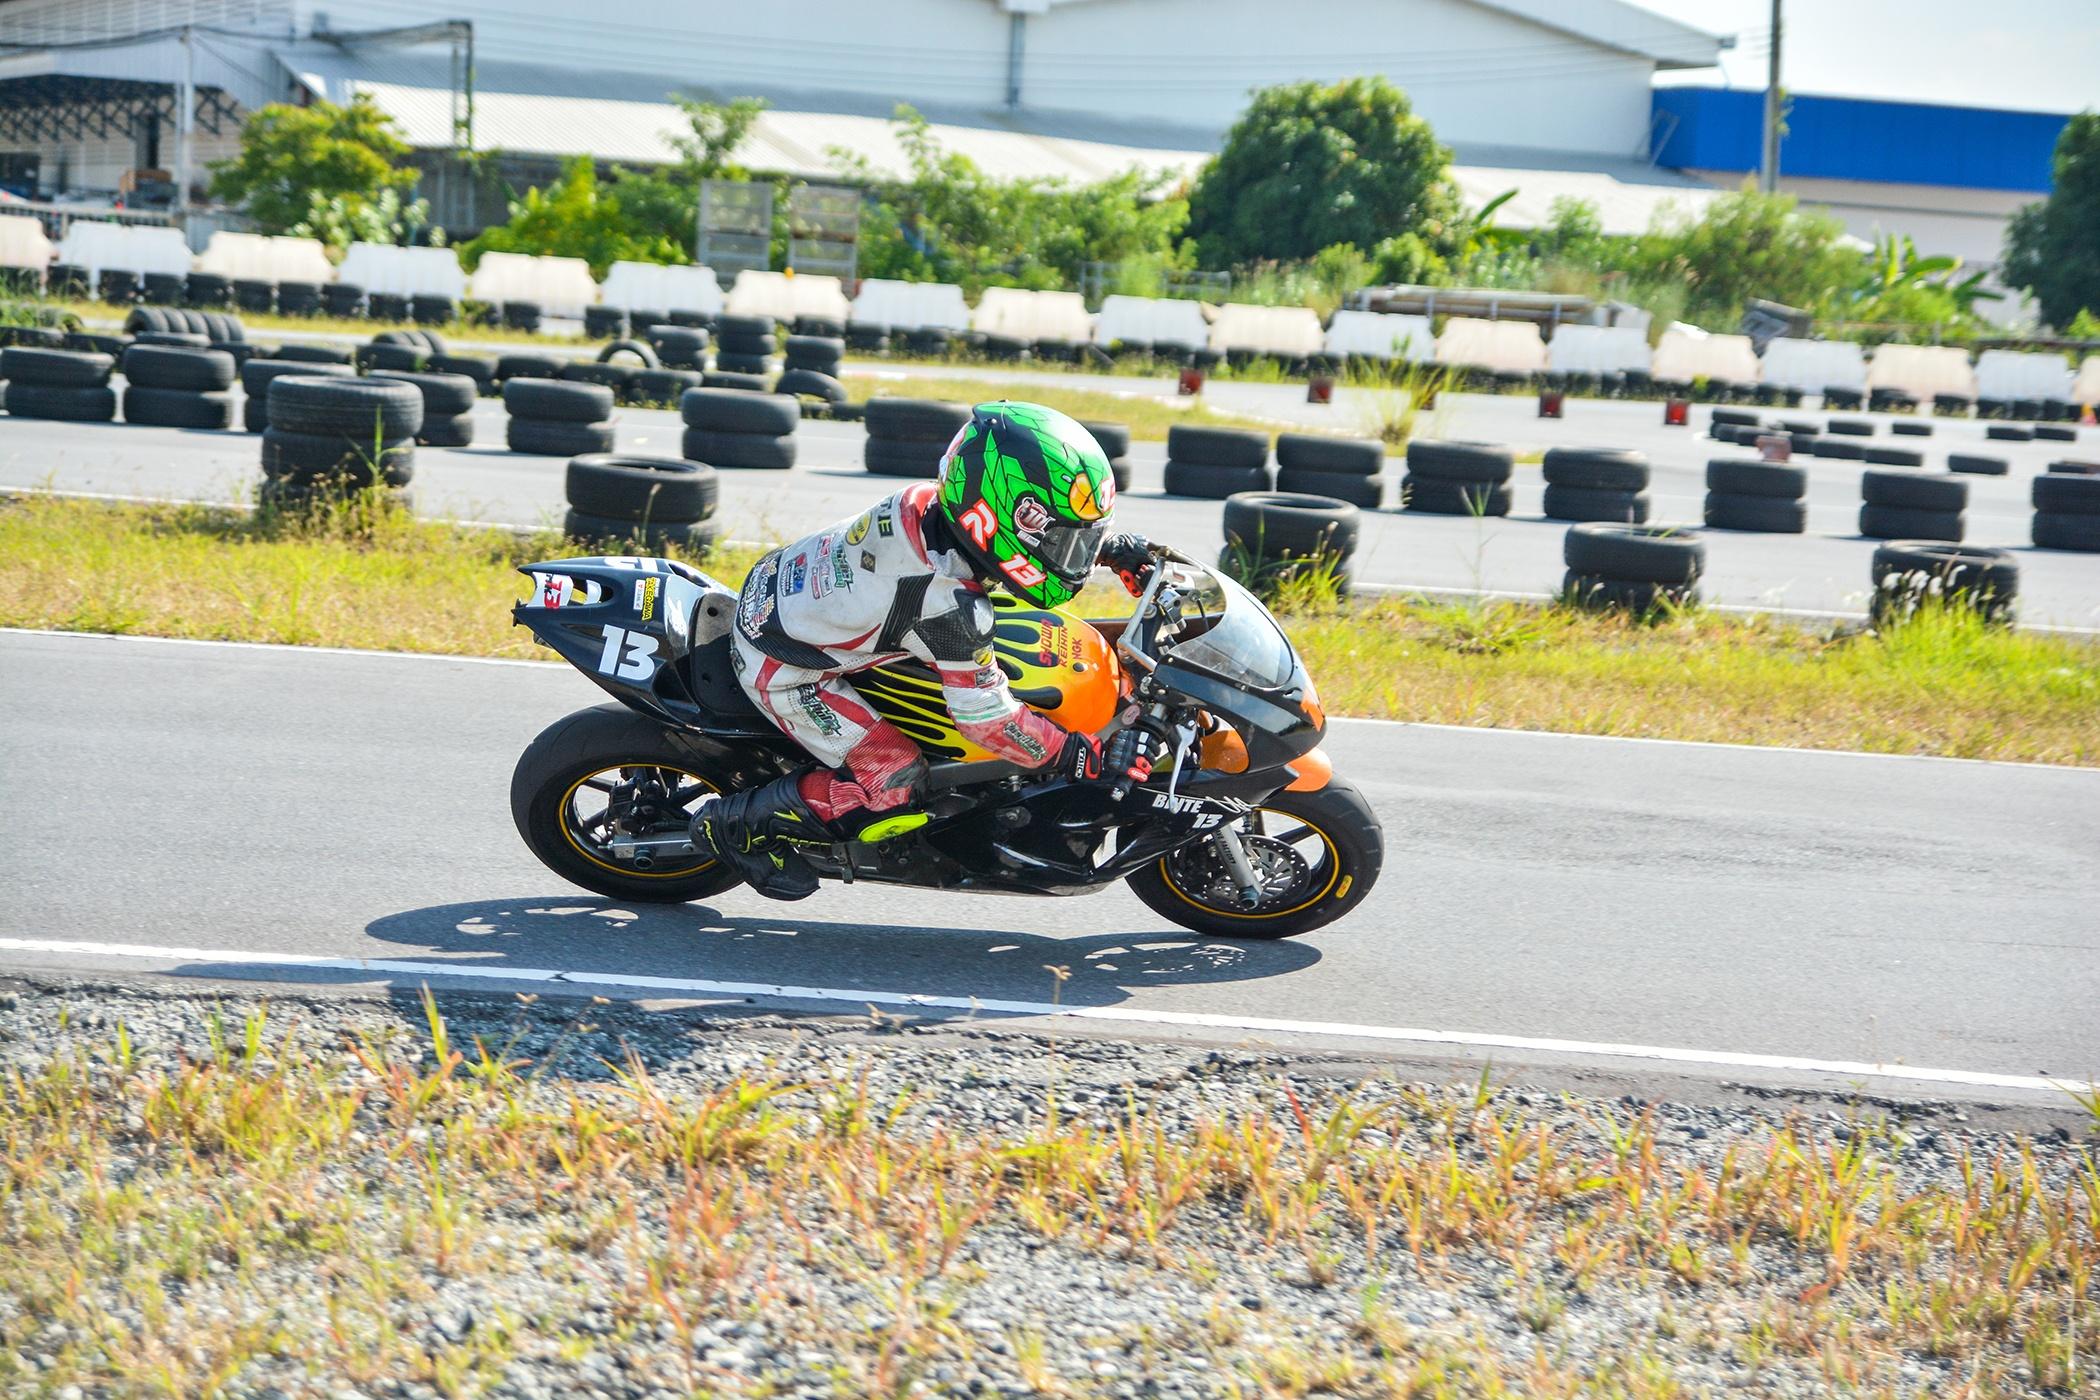 Giai dua moto tre em o Thai Lan va nhung giac mo MotoGP hinh anh 28